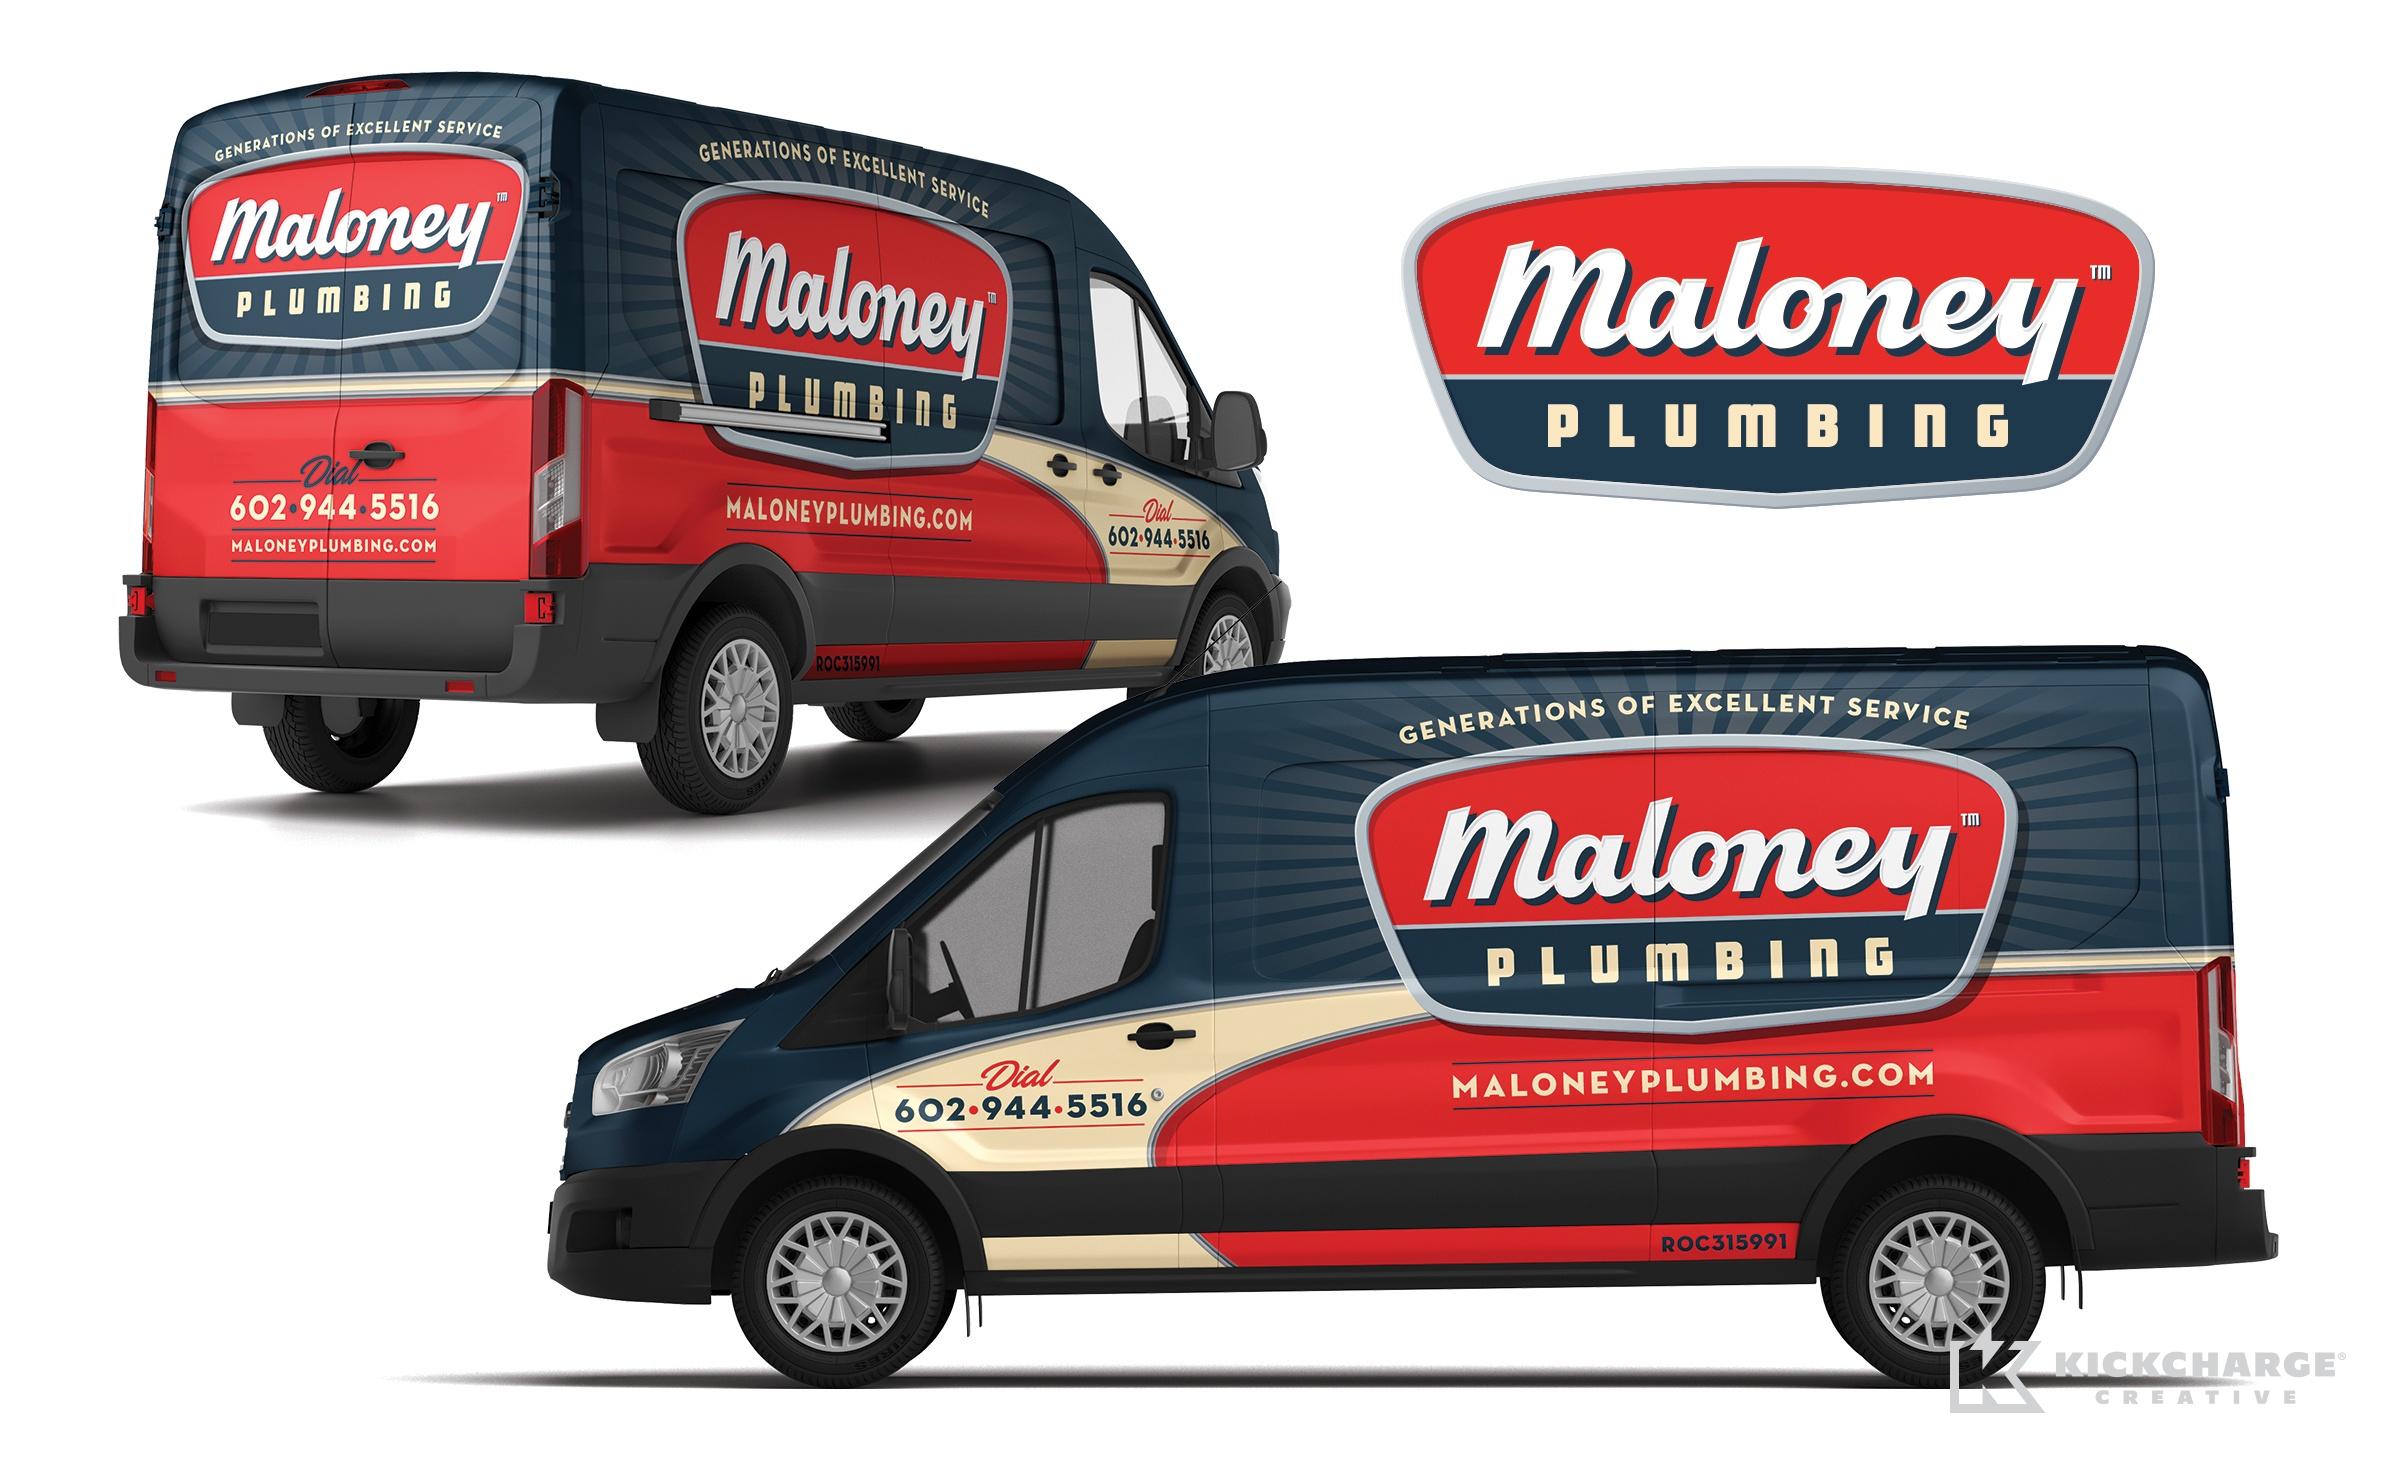 Maloney Plumbing